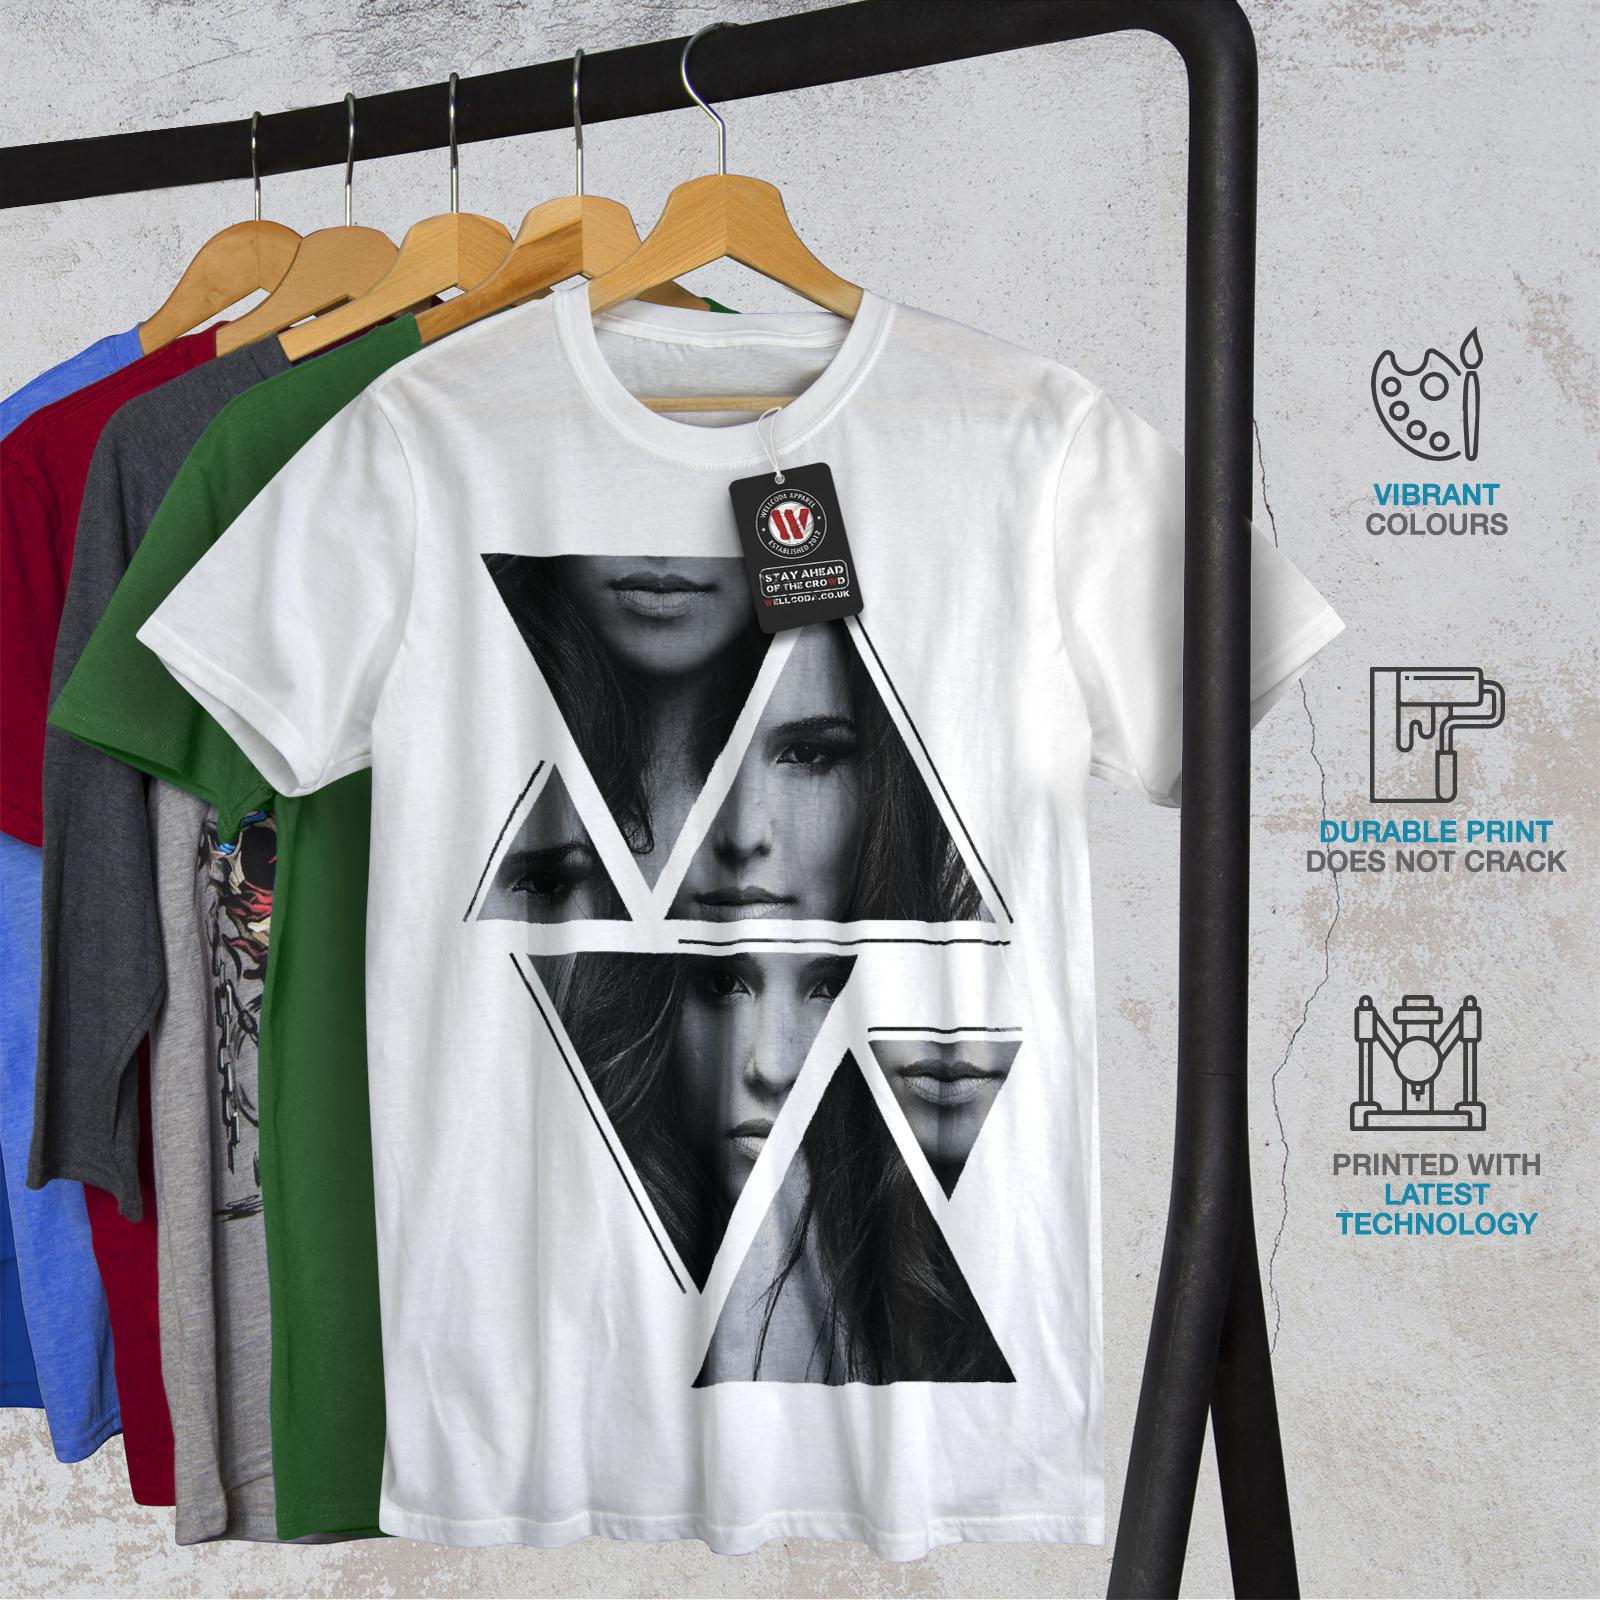 Wellcoda-Art-Fashion-Face-T-shirt-homme-Abstract-Design-graphique-imprime-Tee miniature 12